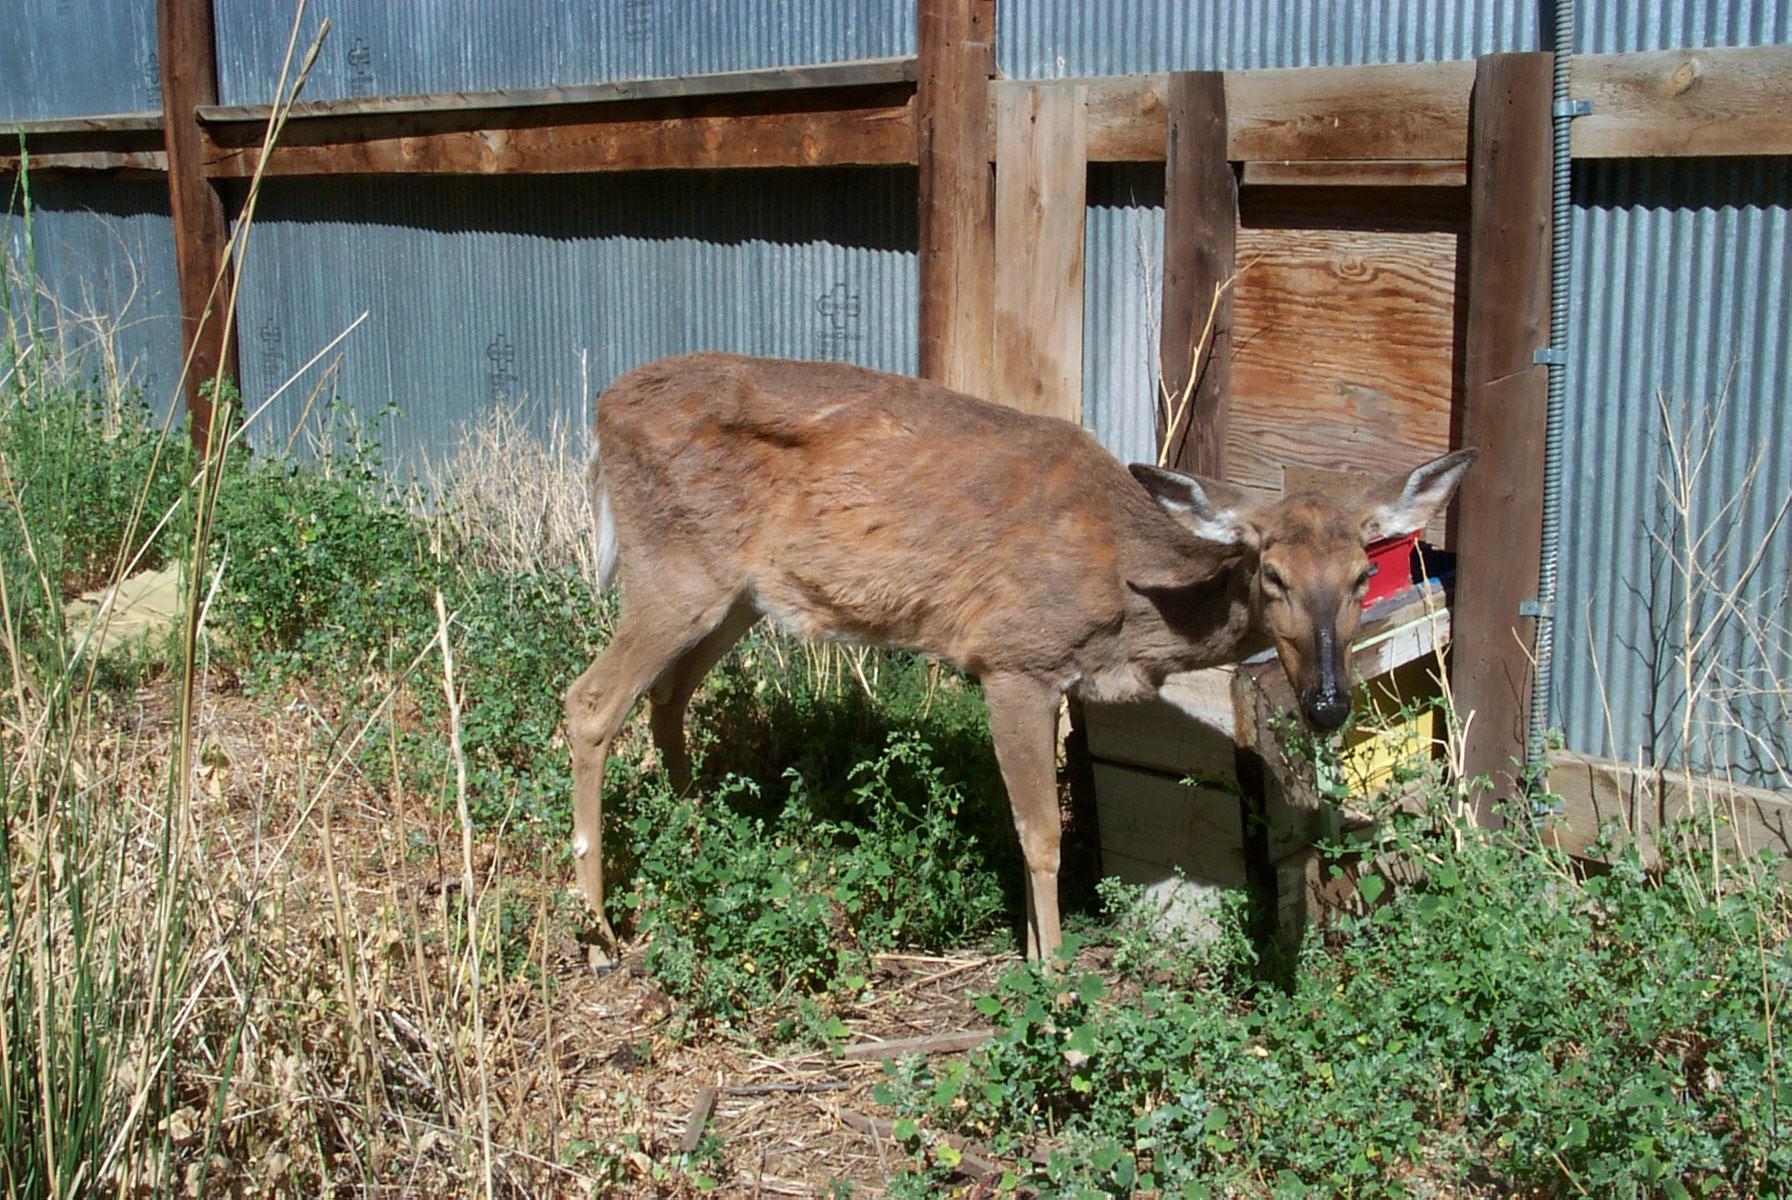 deer hunting thesis statement Free research that covers vegetarians vs meat eaters vegetarians vs meat eaters thesis statement vegetarians vs meateaters deer hunting laws.